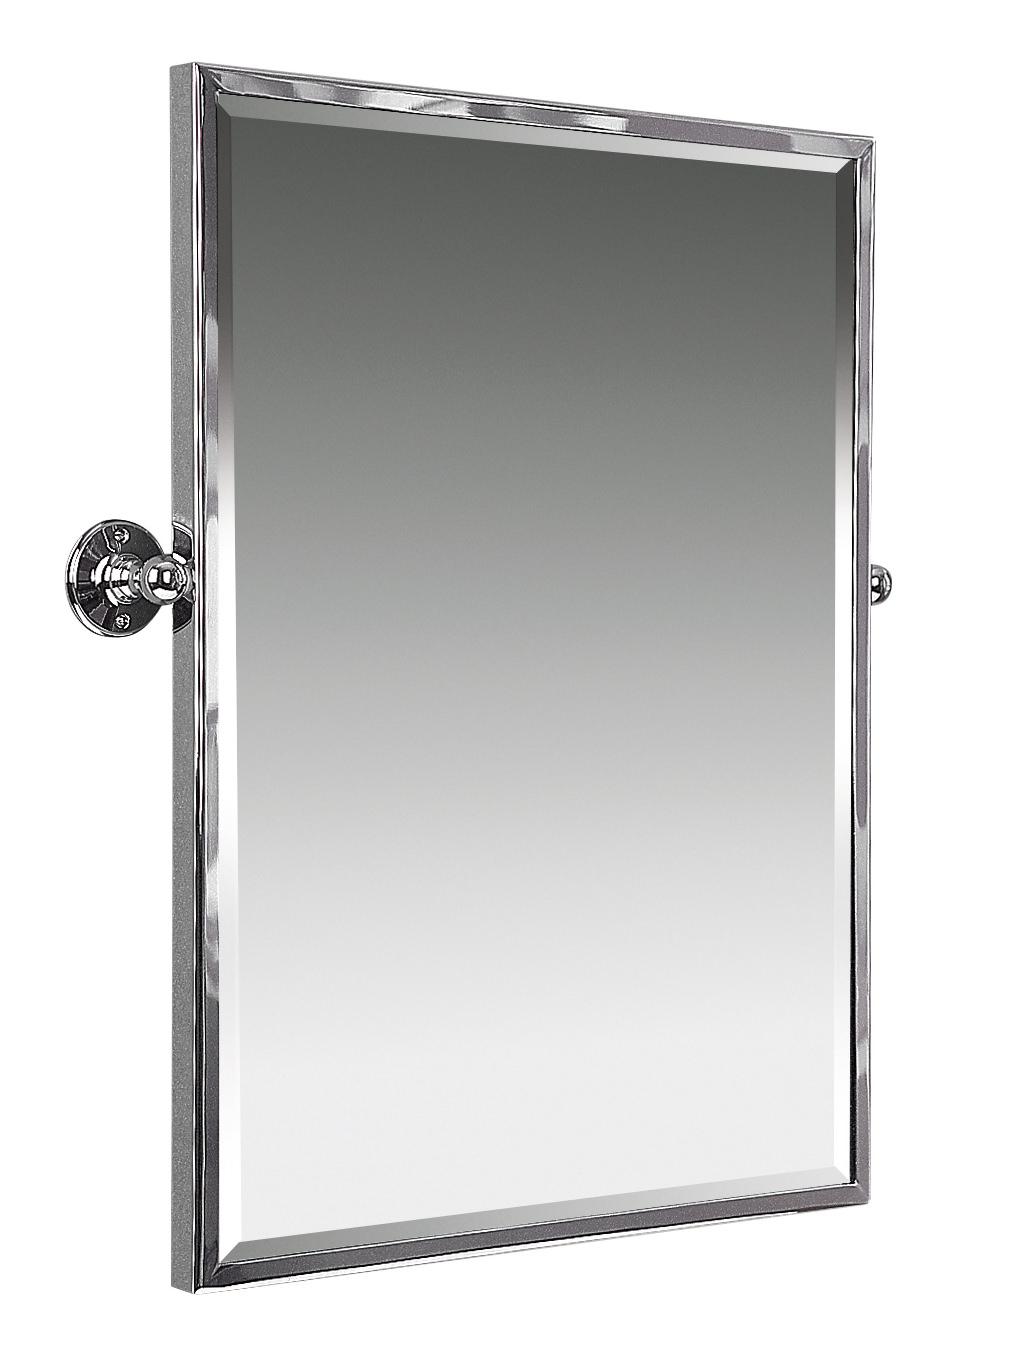 610mm Framed Swivel Mirror, Swivel Bathroom Mirror